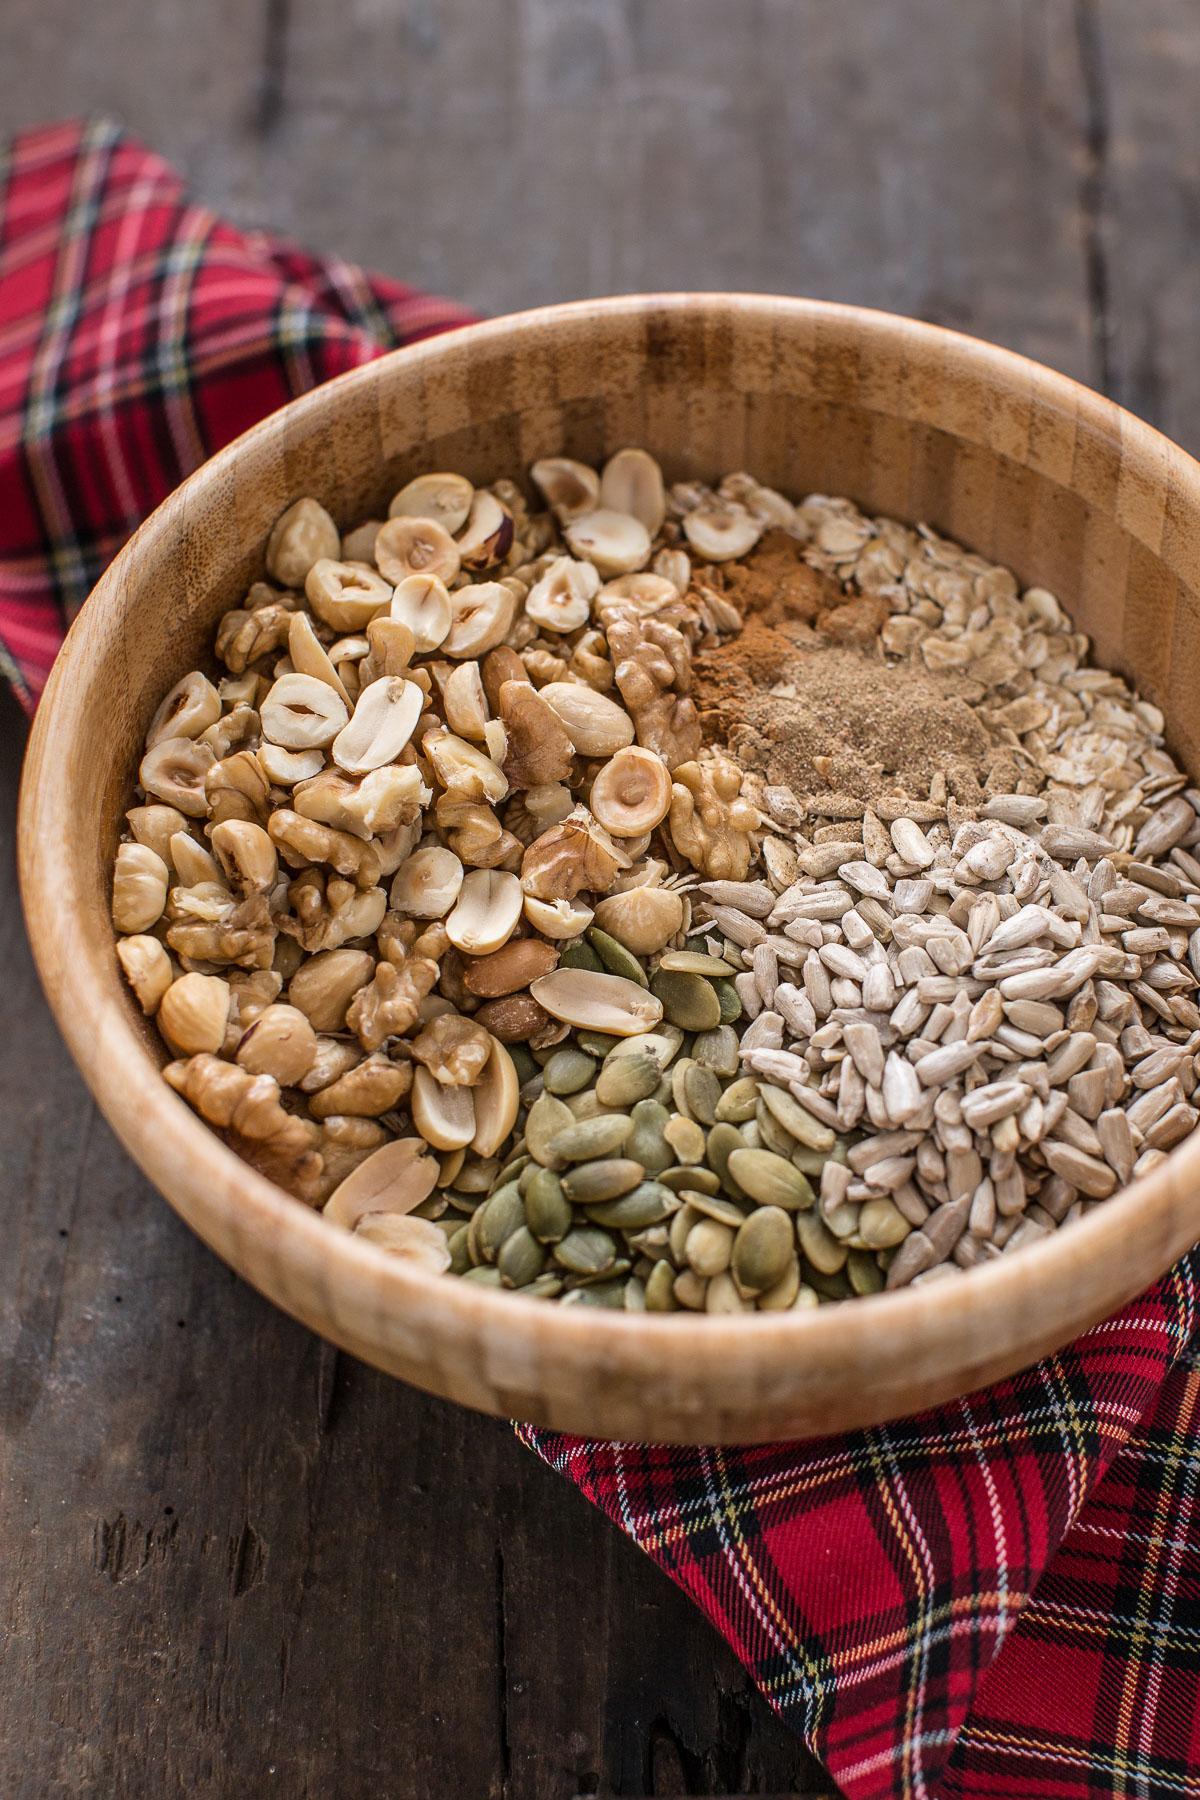 ricetta granola light alla zucca granola fatta-in-casa-vegan-pumpkin-granola-with-hazelnuts-and-pumpkin-seeds-2